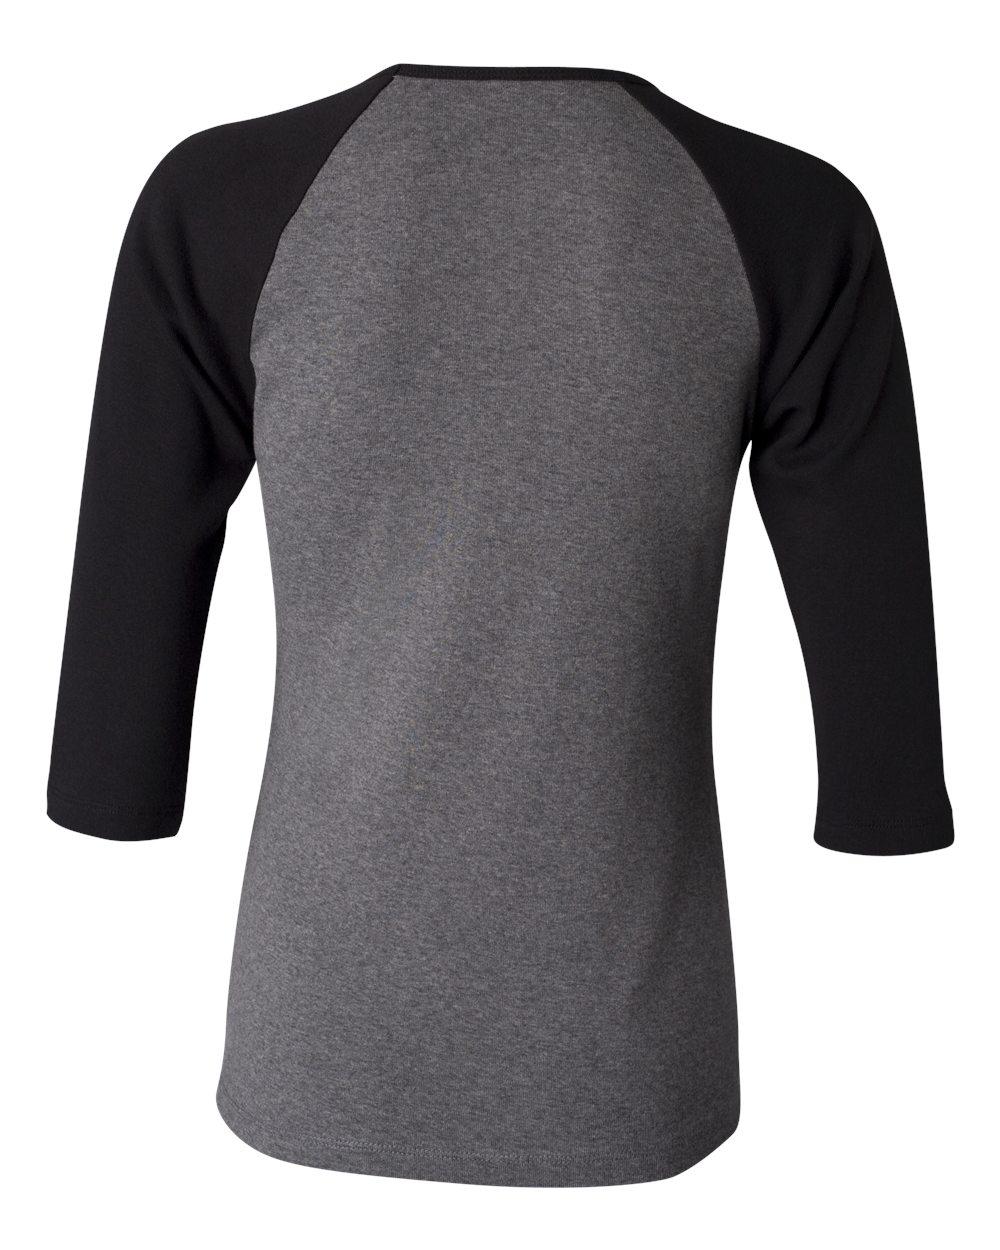 Bella-Canvas-Womens-Stretch-Rib-3-4-Sleeve-Contrast-Raglan-T-Shirt-B2000 thumbnail 11